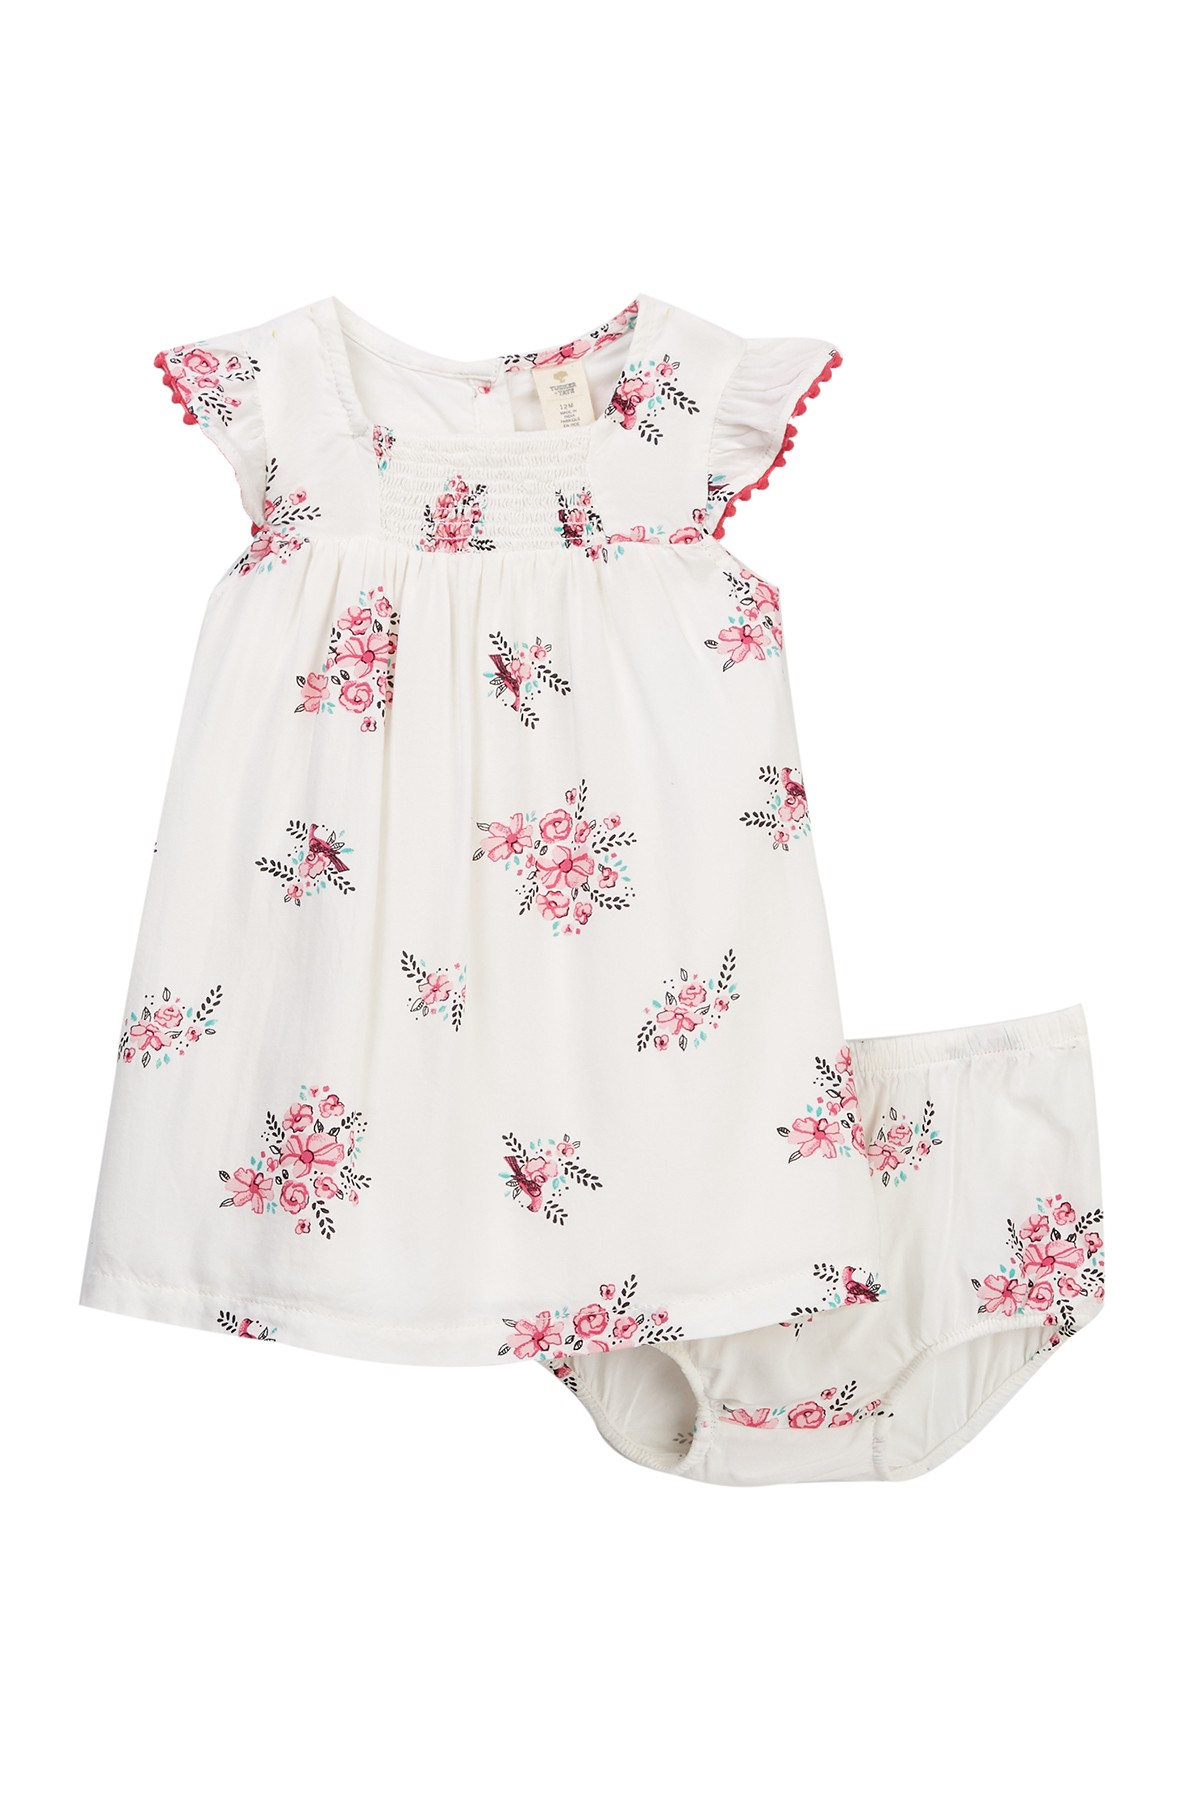 Tucker Tate Smocked Print Dress Set Baby Girls